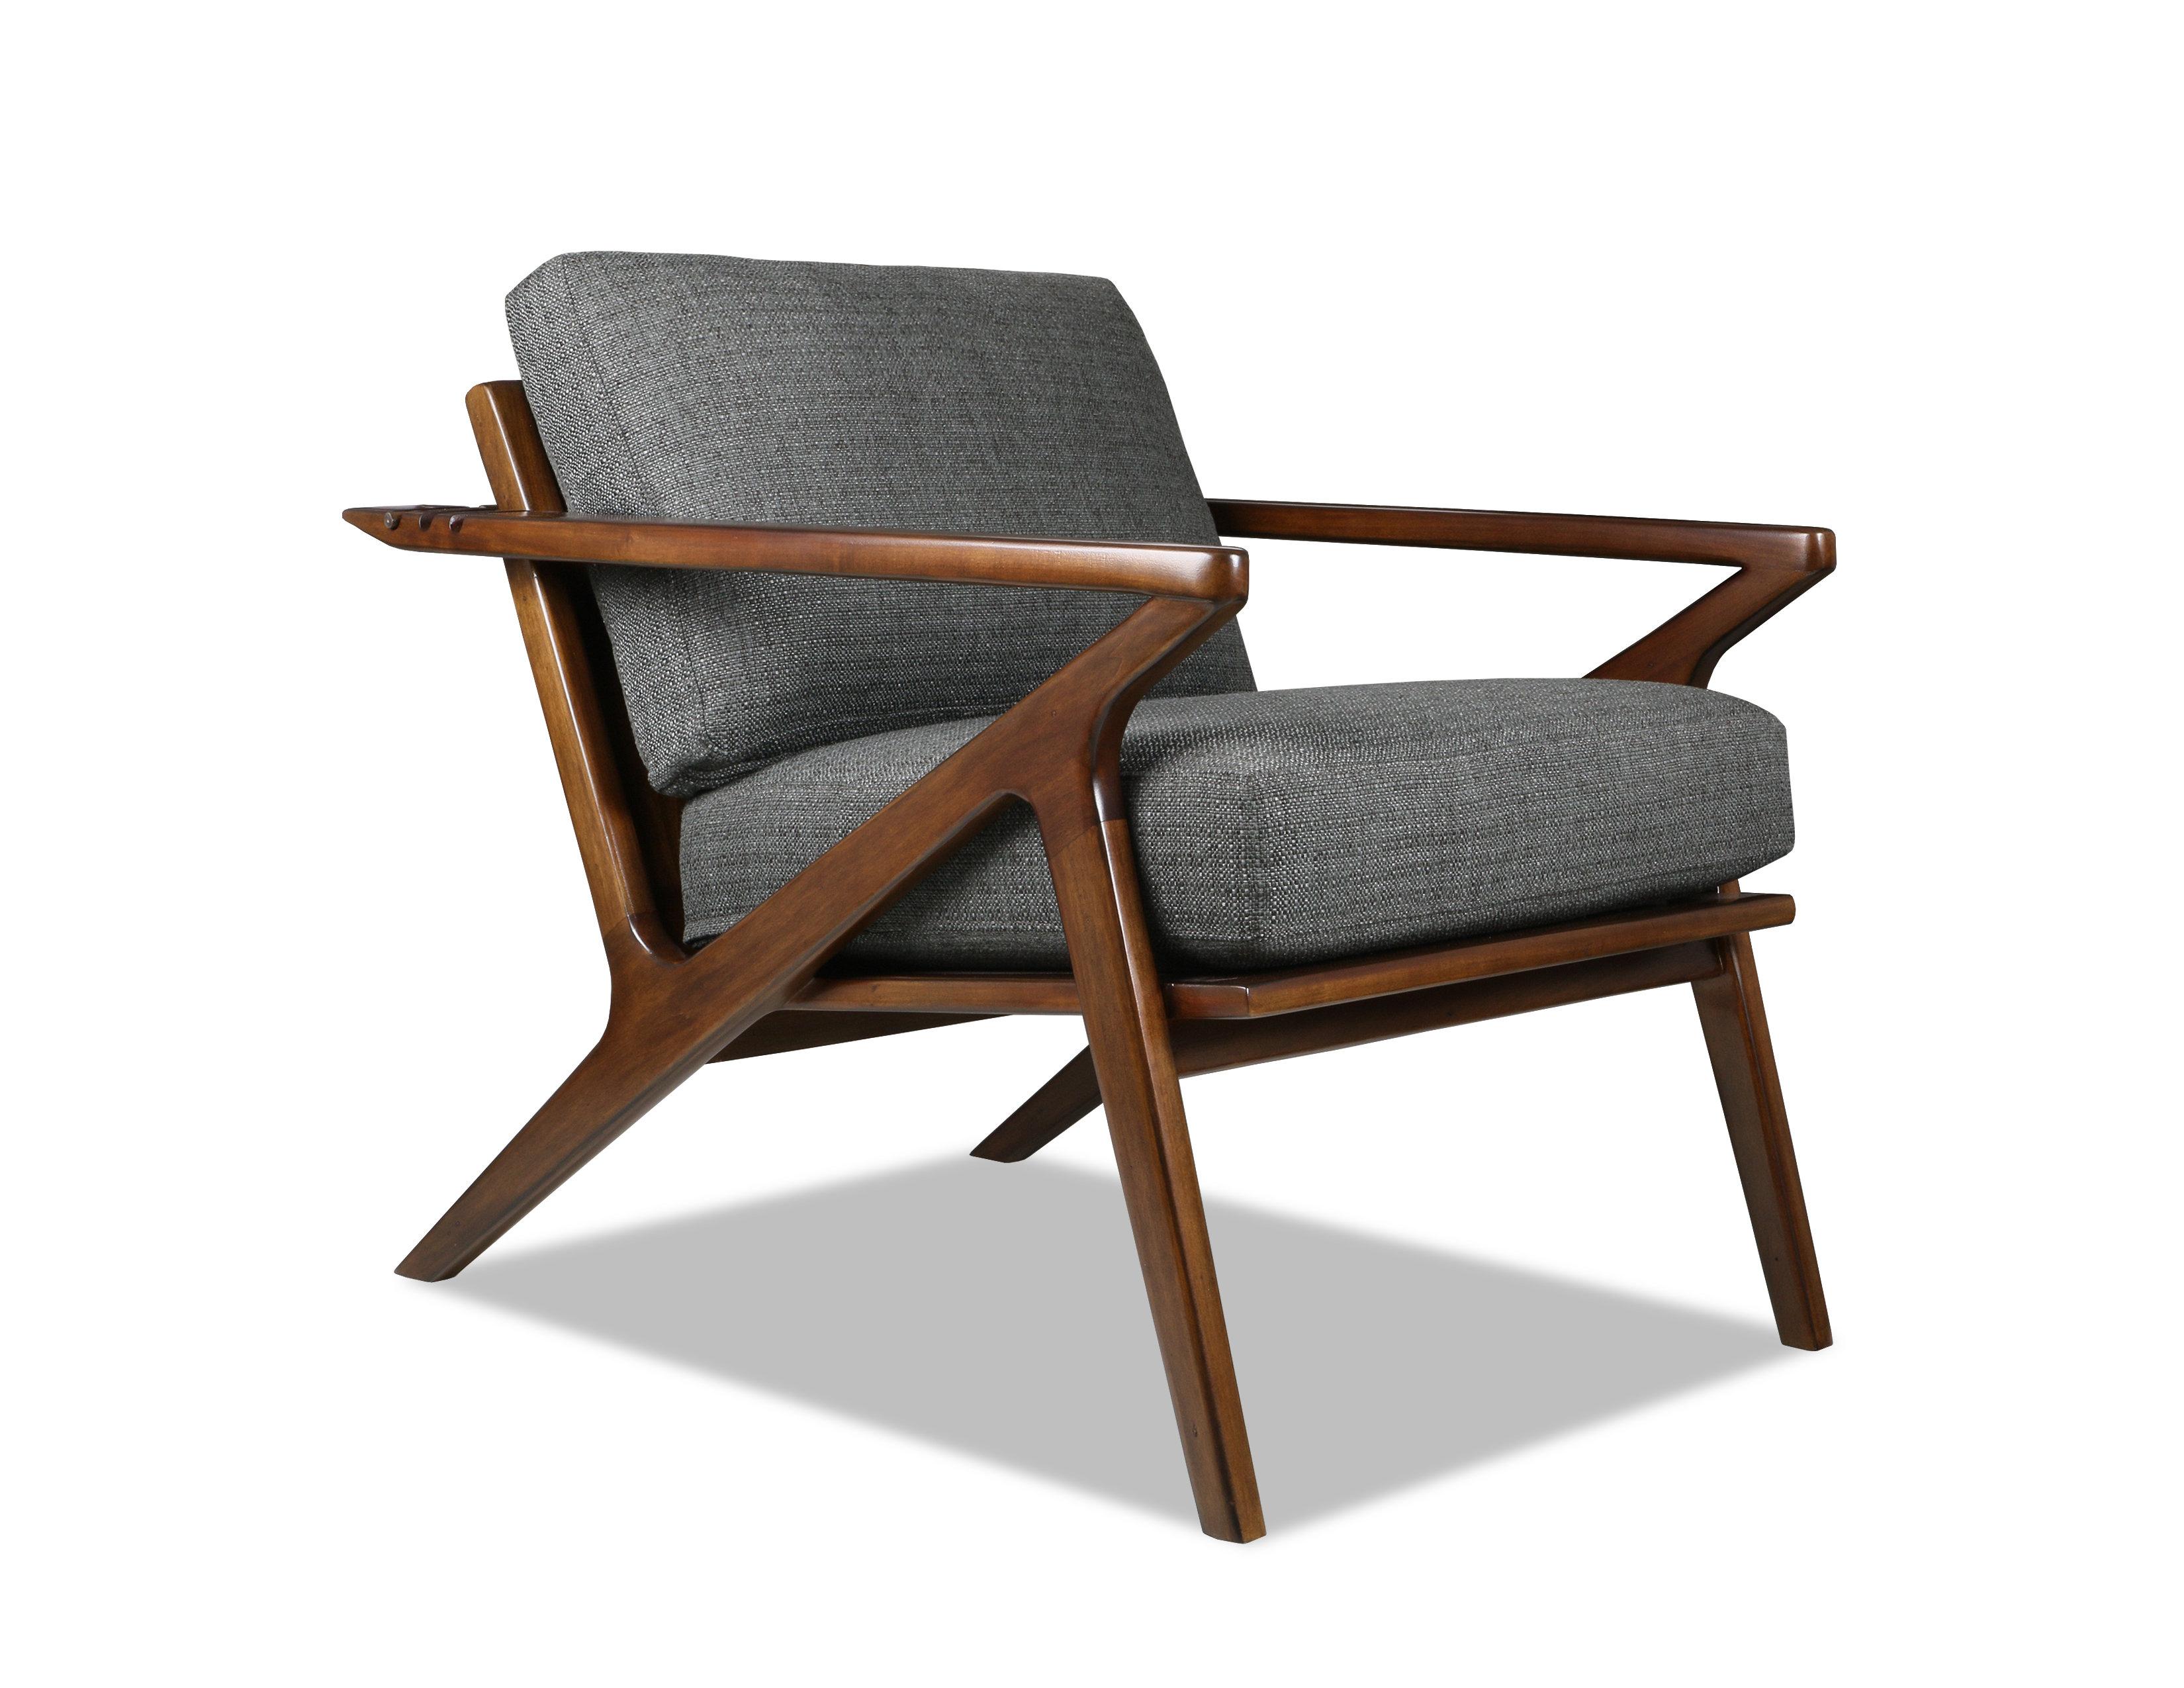 lindsay swivel arm furnitureantiques bent upholstery oliver furniture luv d antiques recliner re custom